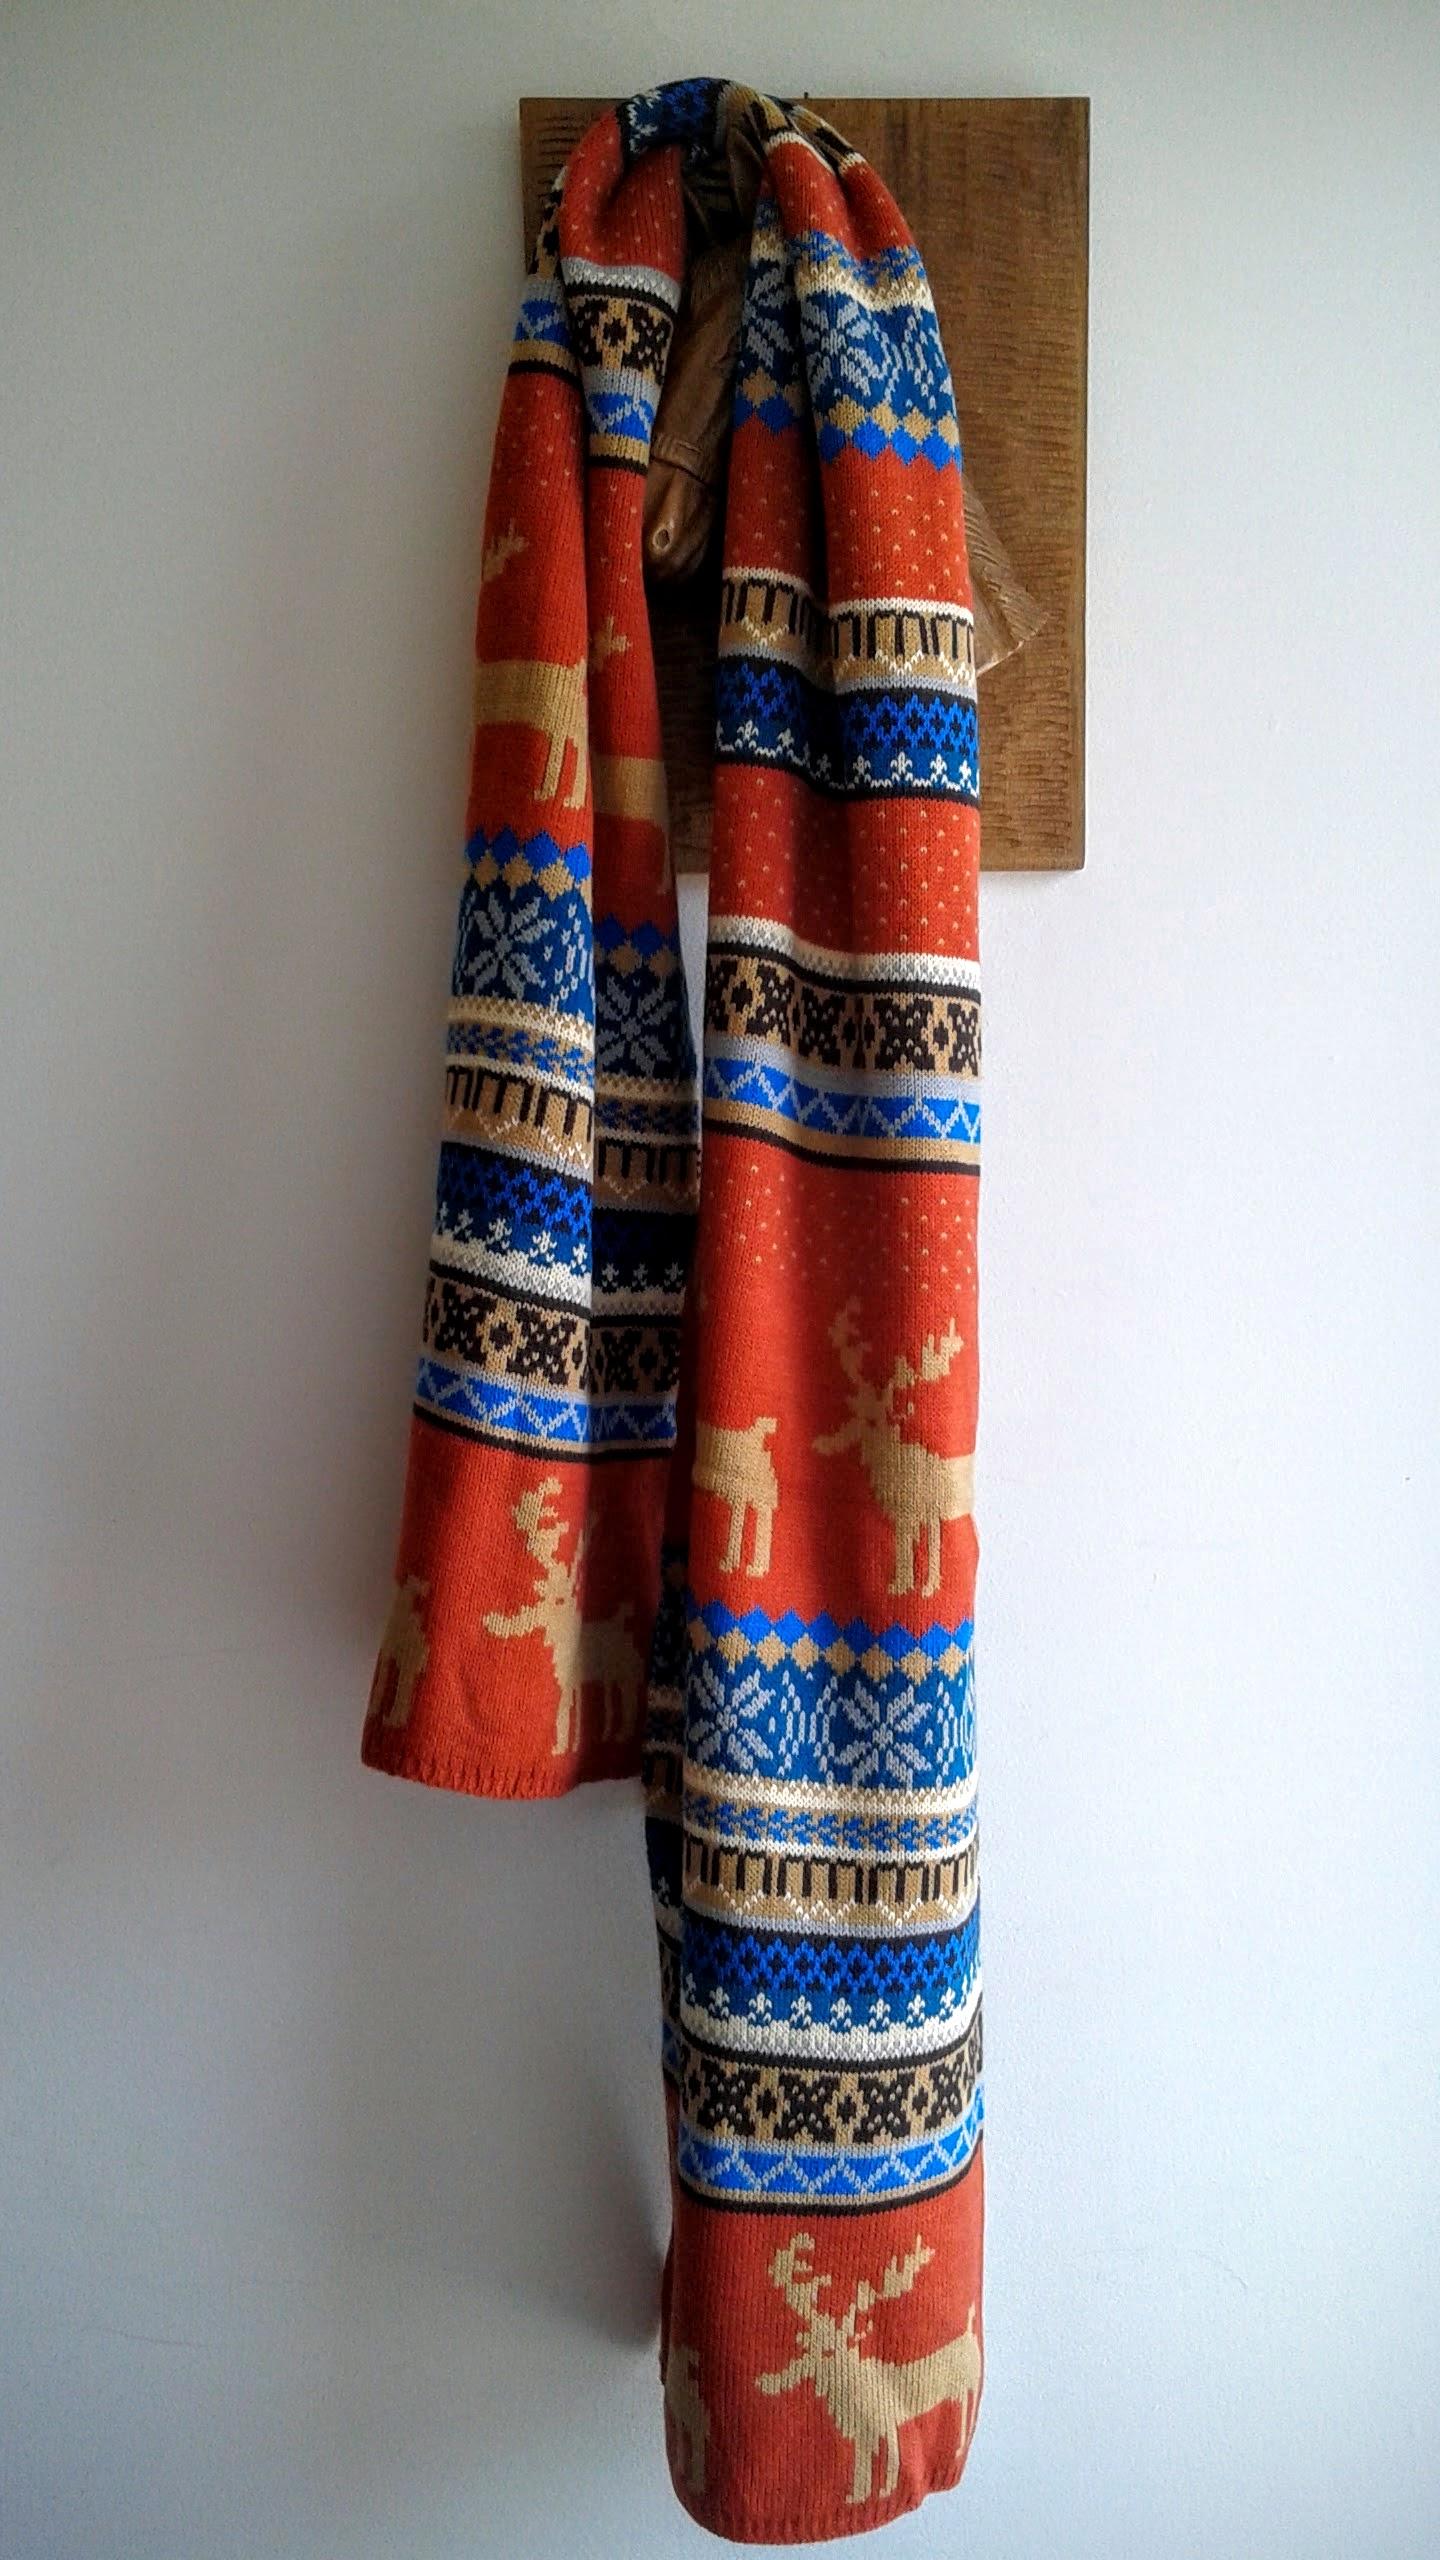 Moose scarf, $16